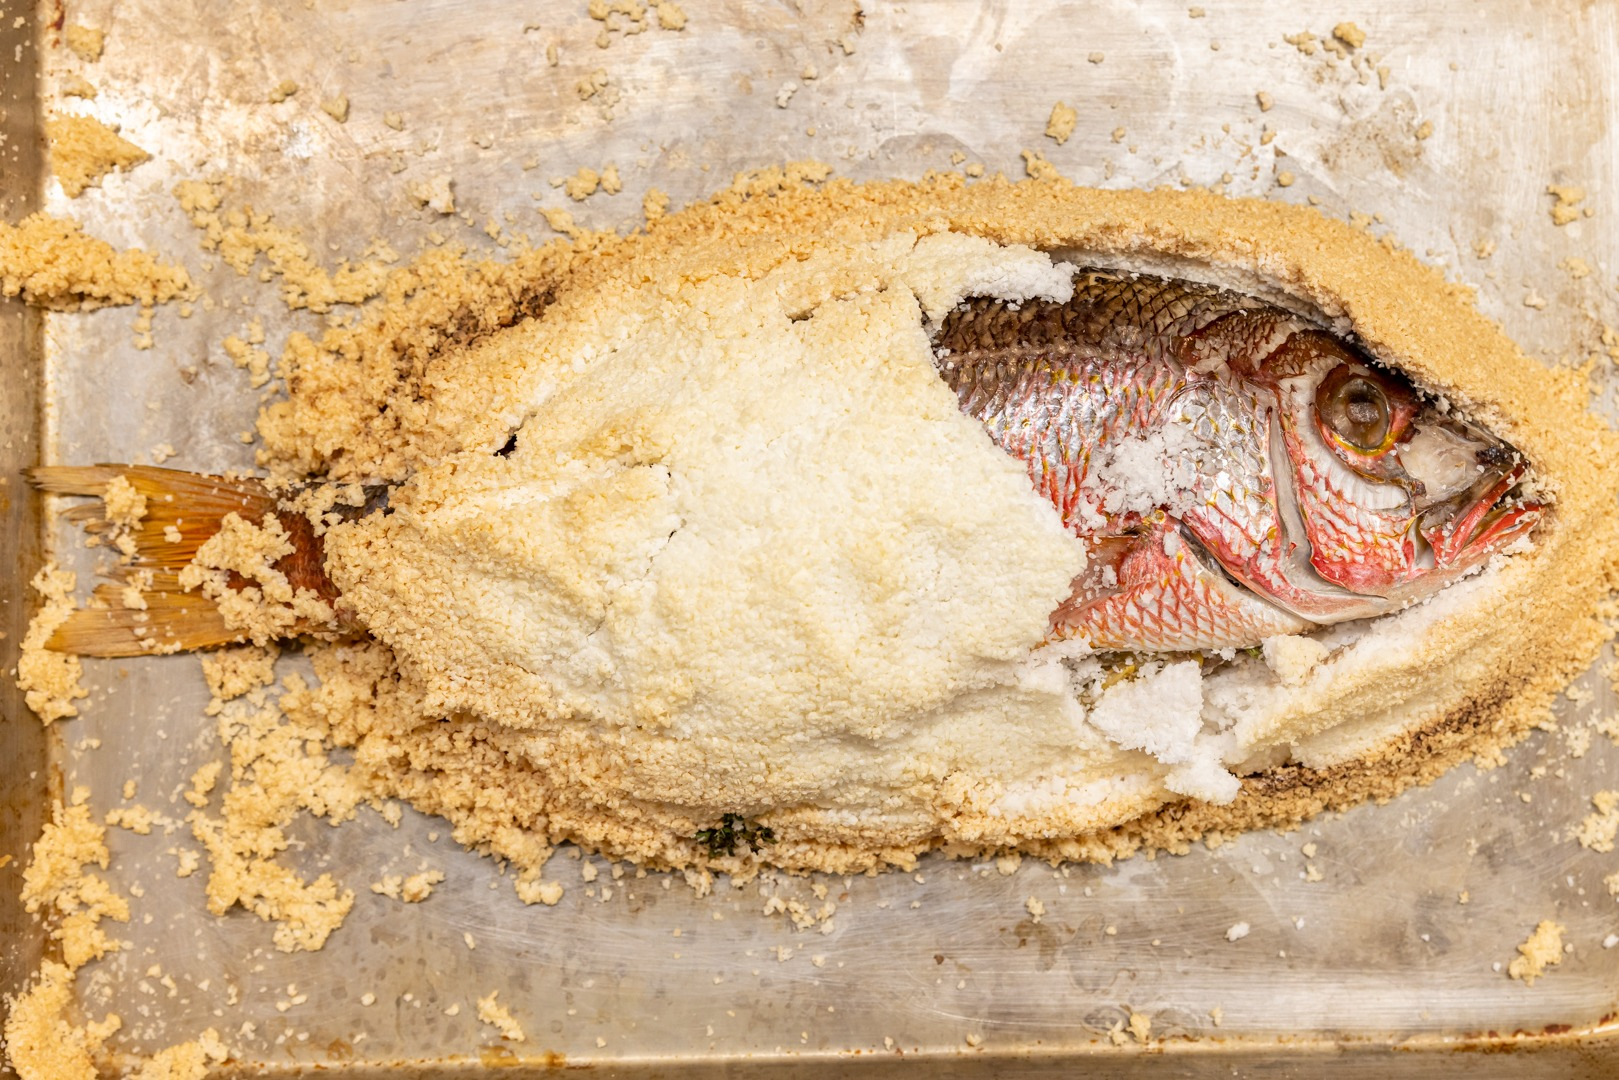 Salt-crusted red snapper